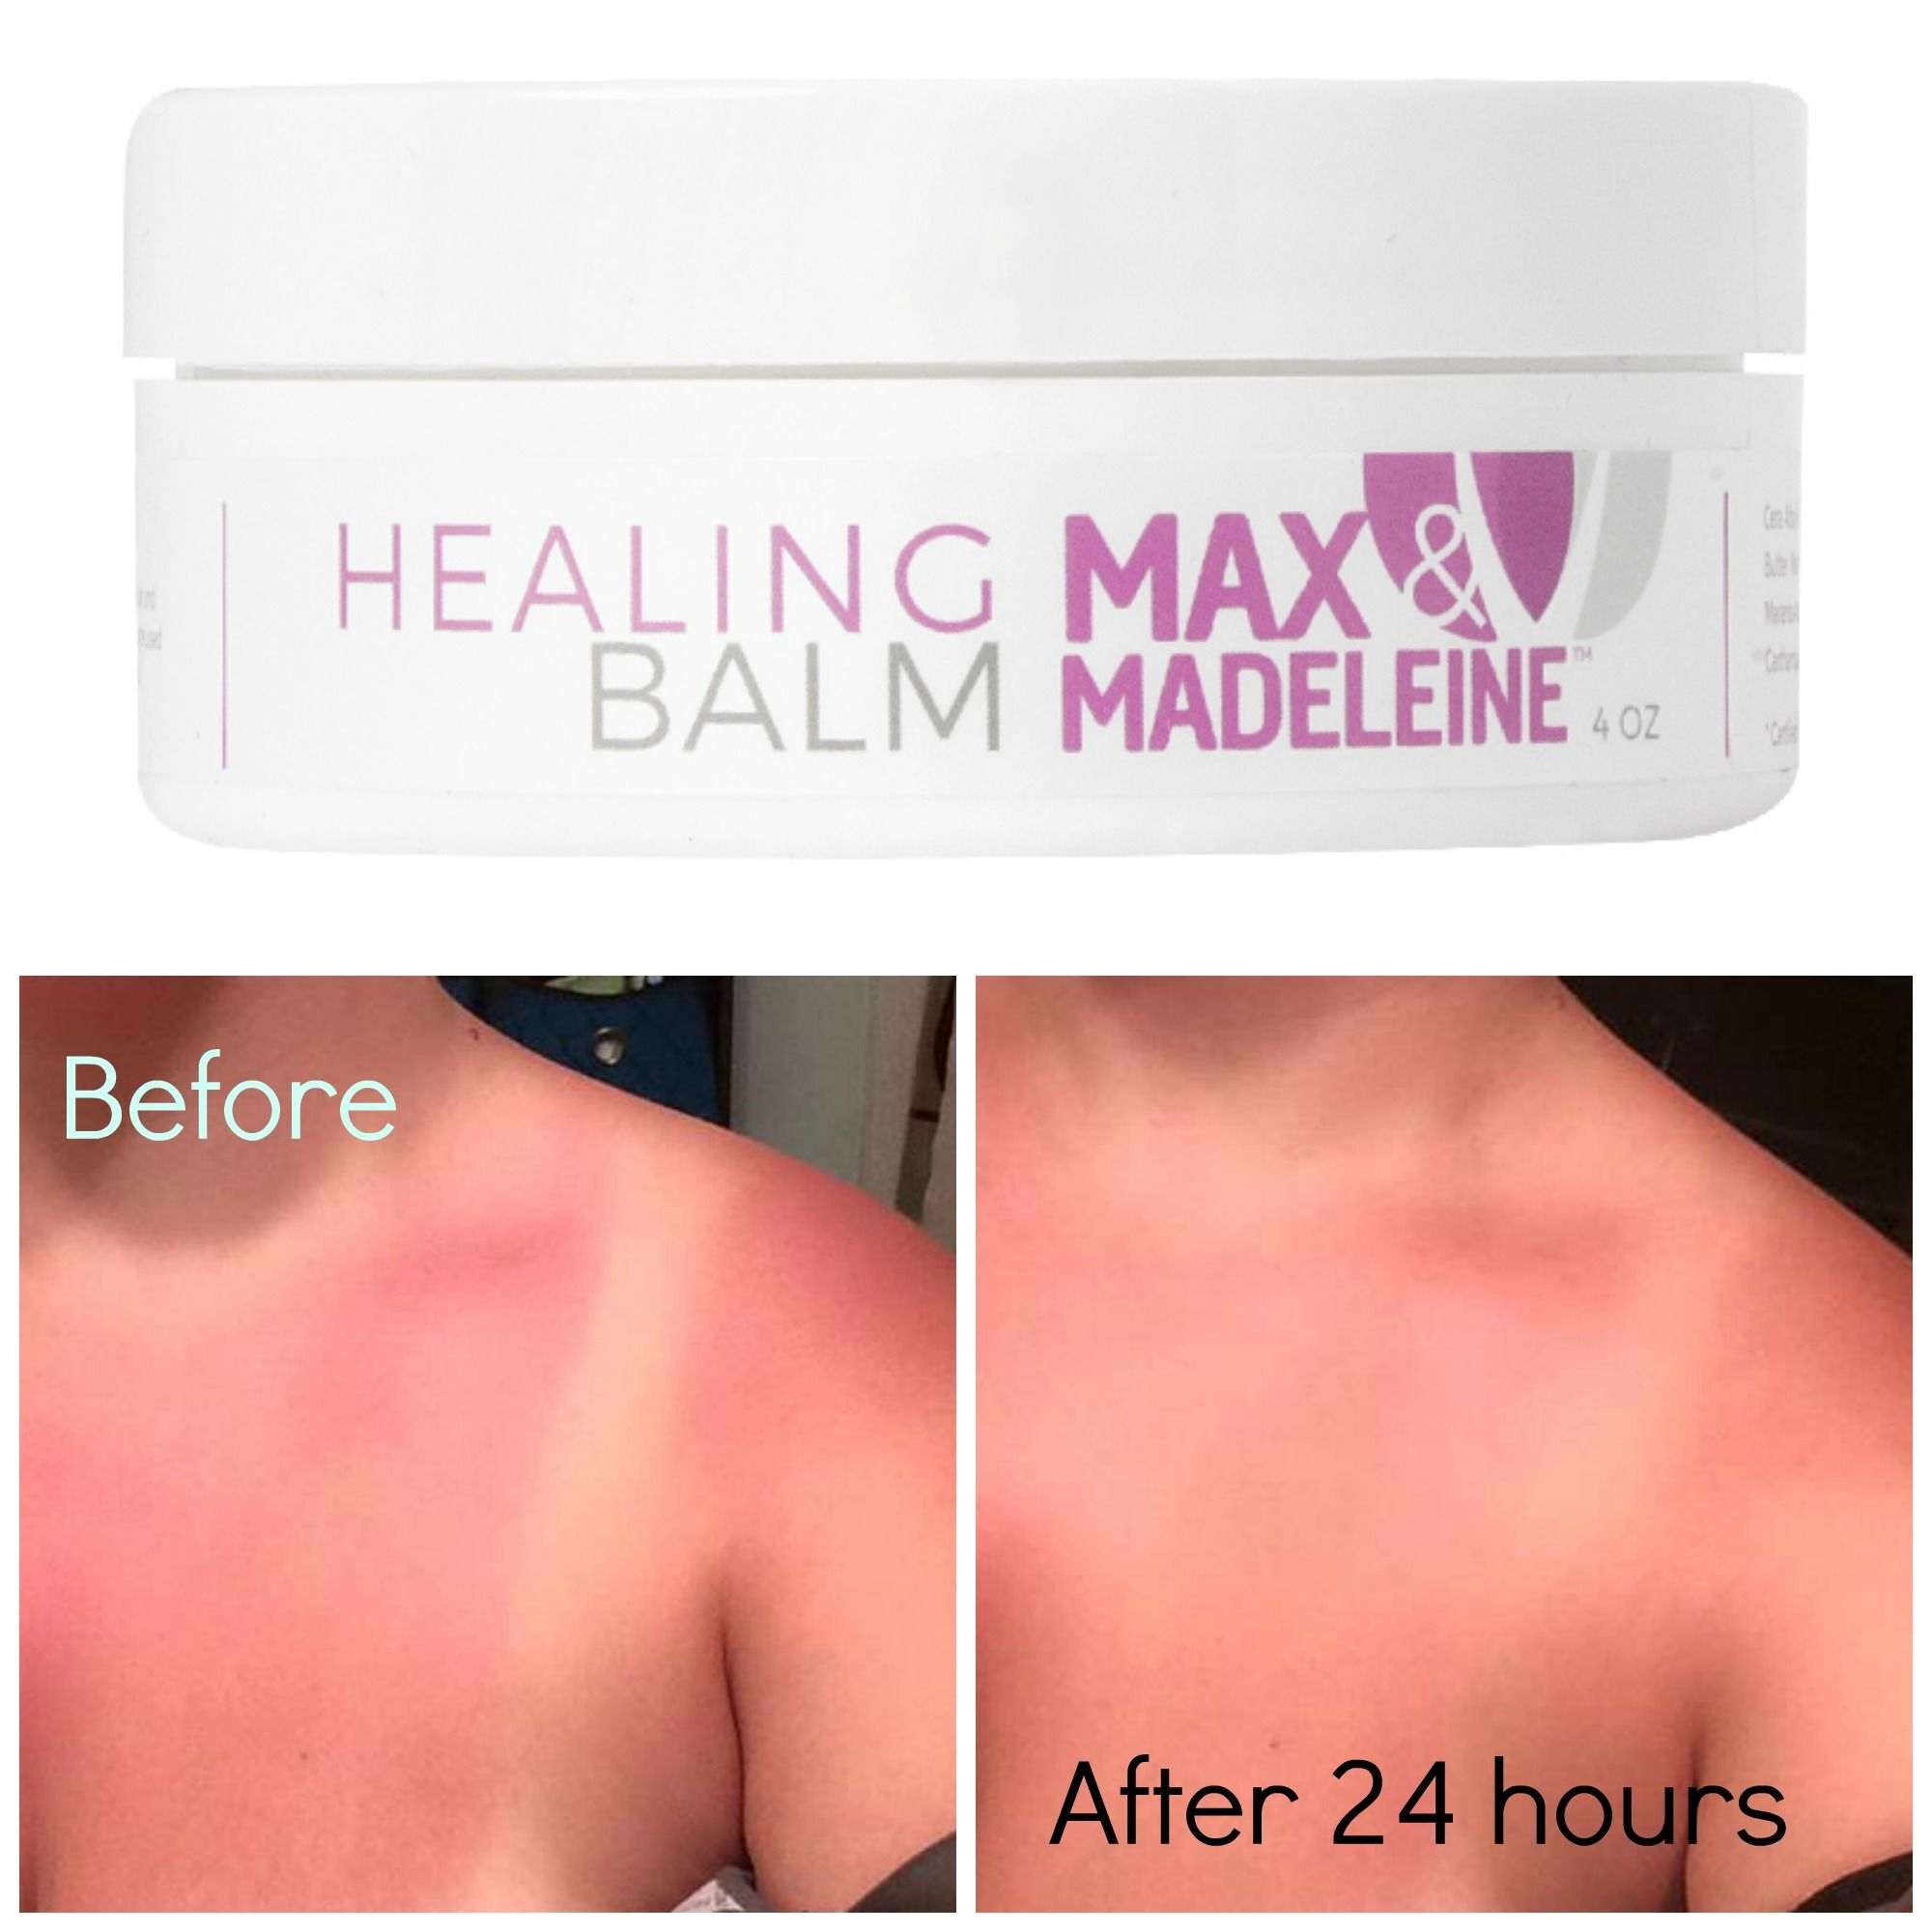 #healing #skincare #organic #nontoxic  Look at my results!! Bye Bye sunburn!